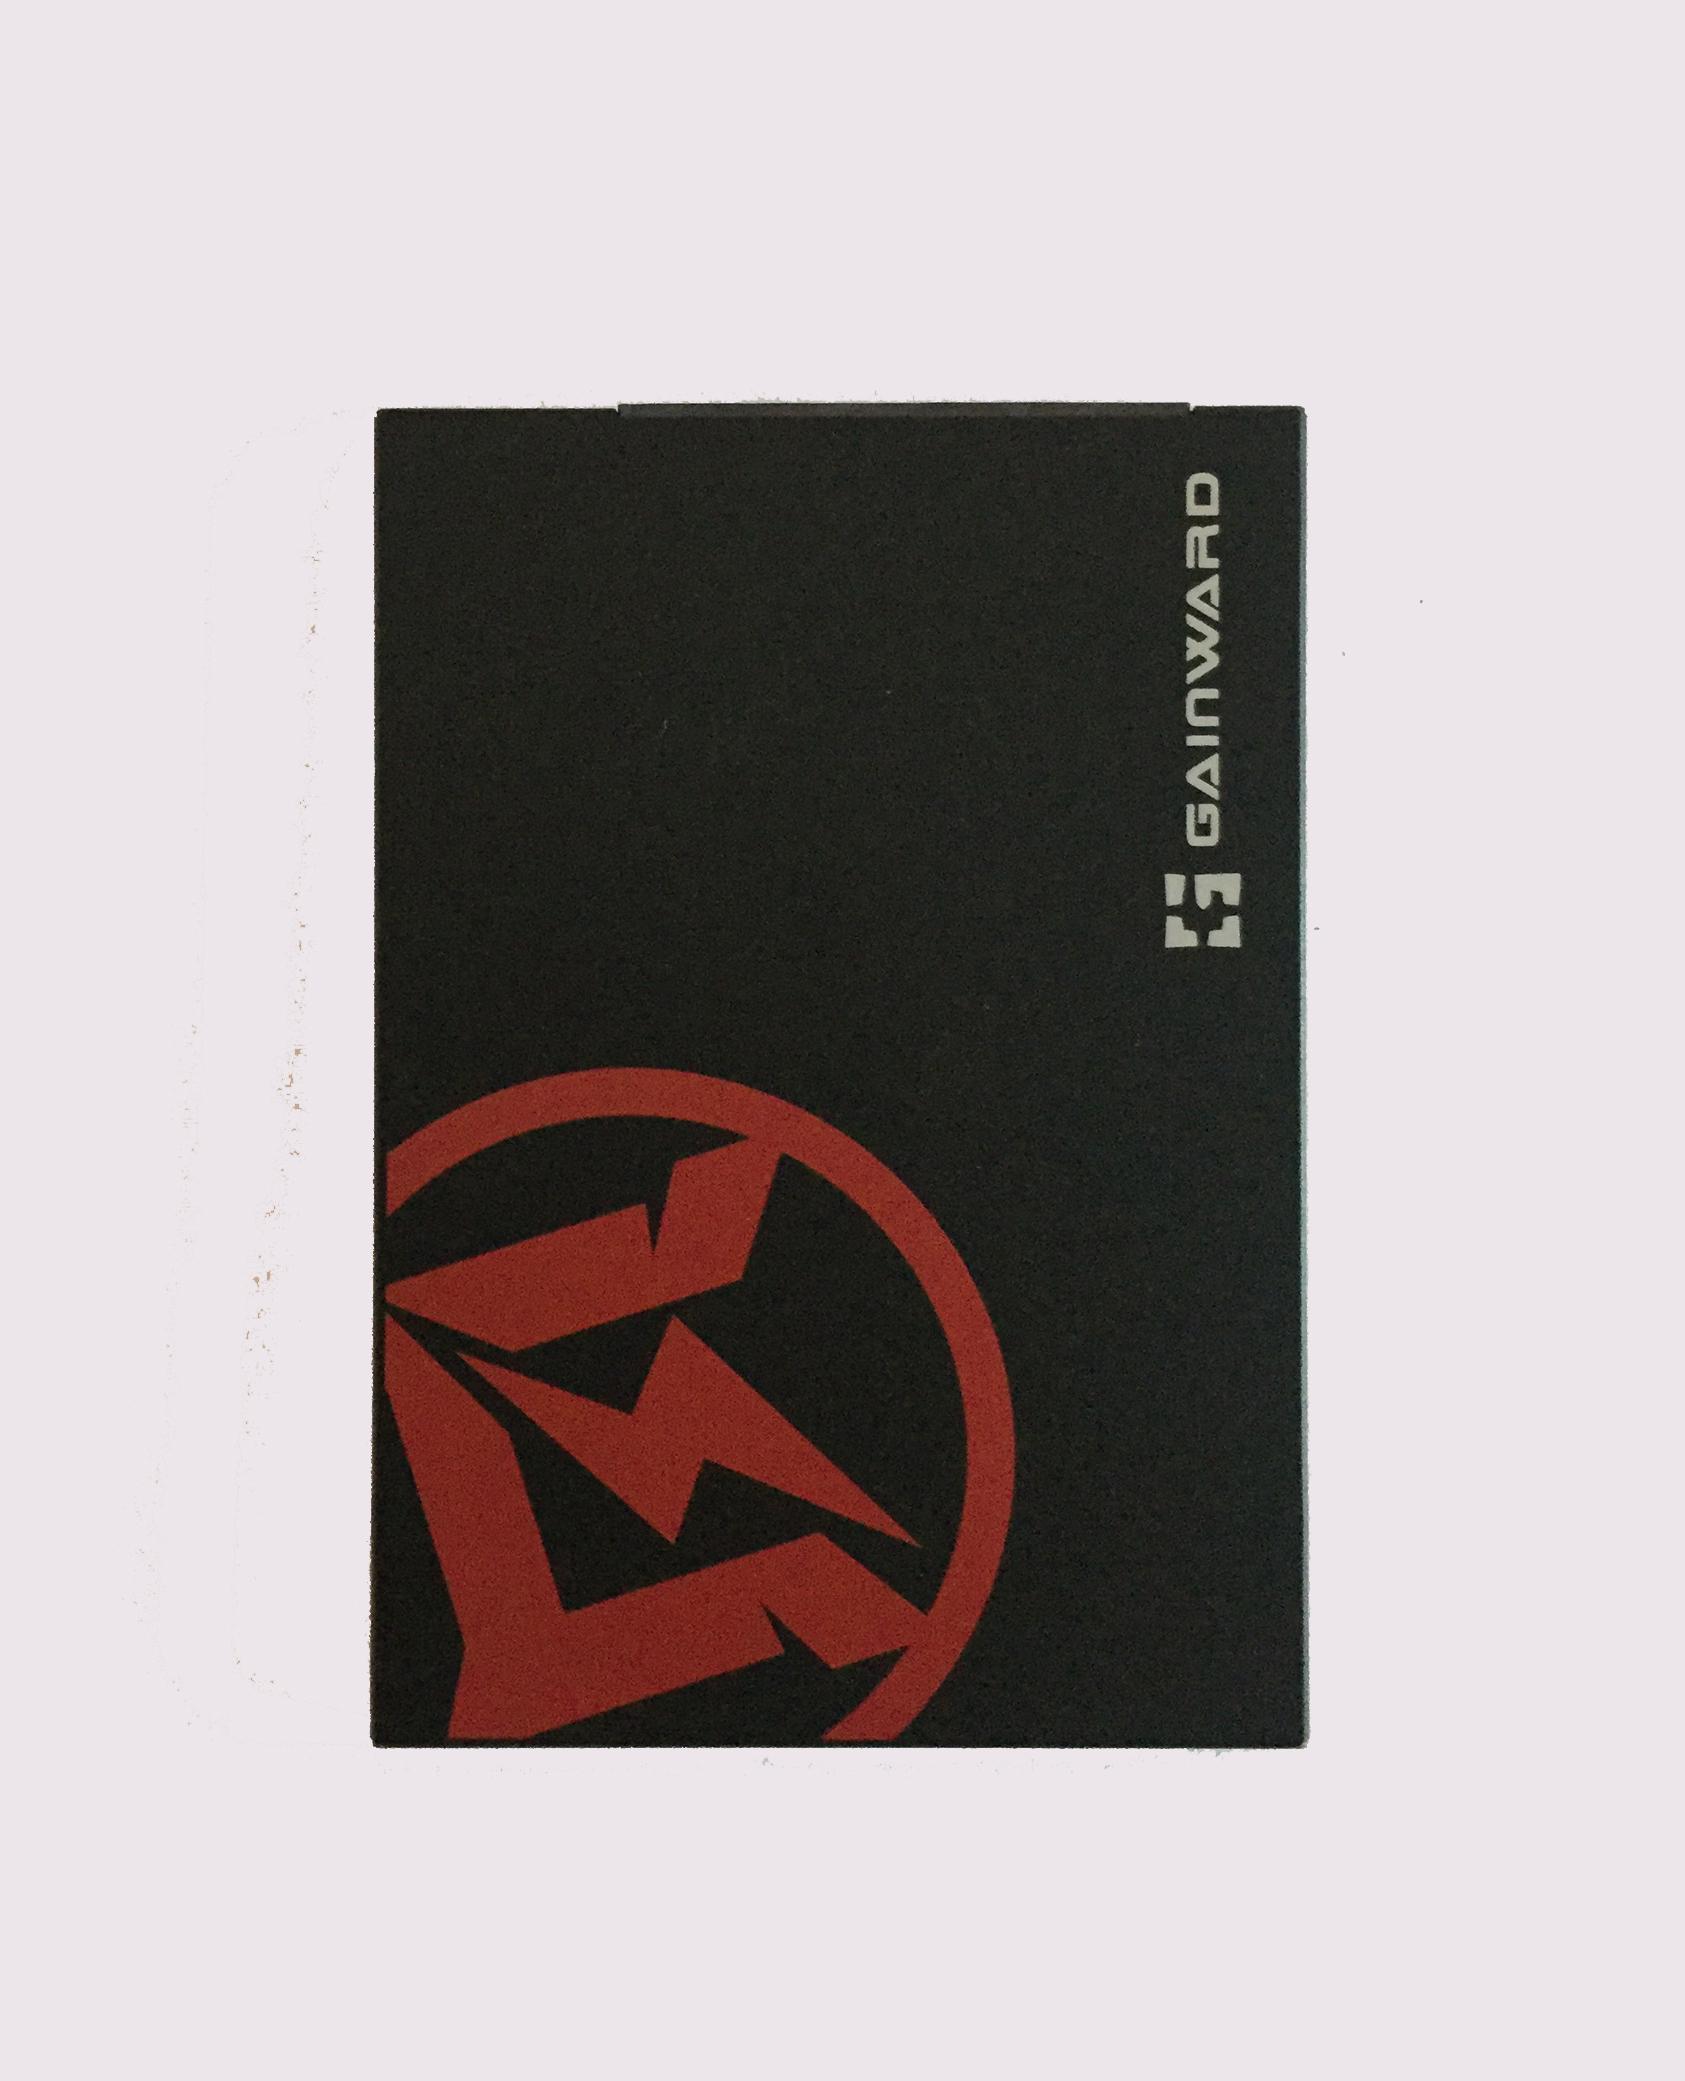 SSD mới - GainWard 120GB | Laptop Danh Phong